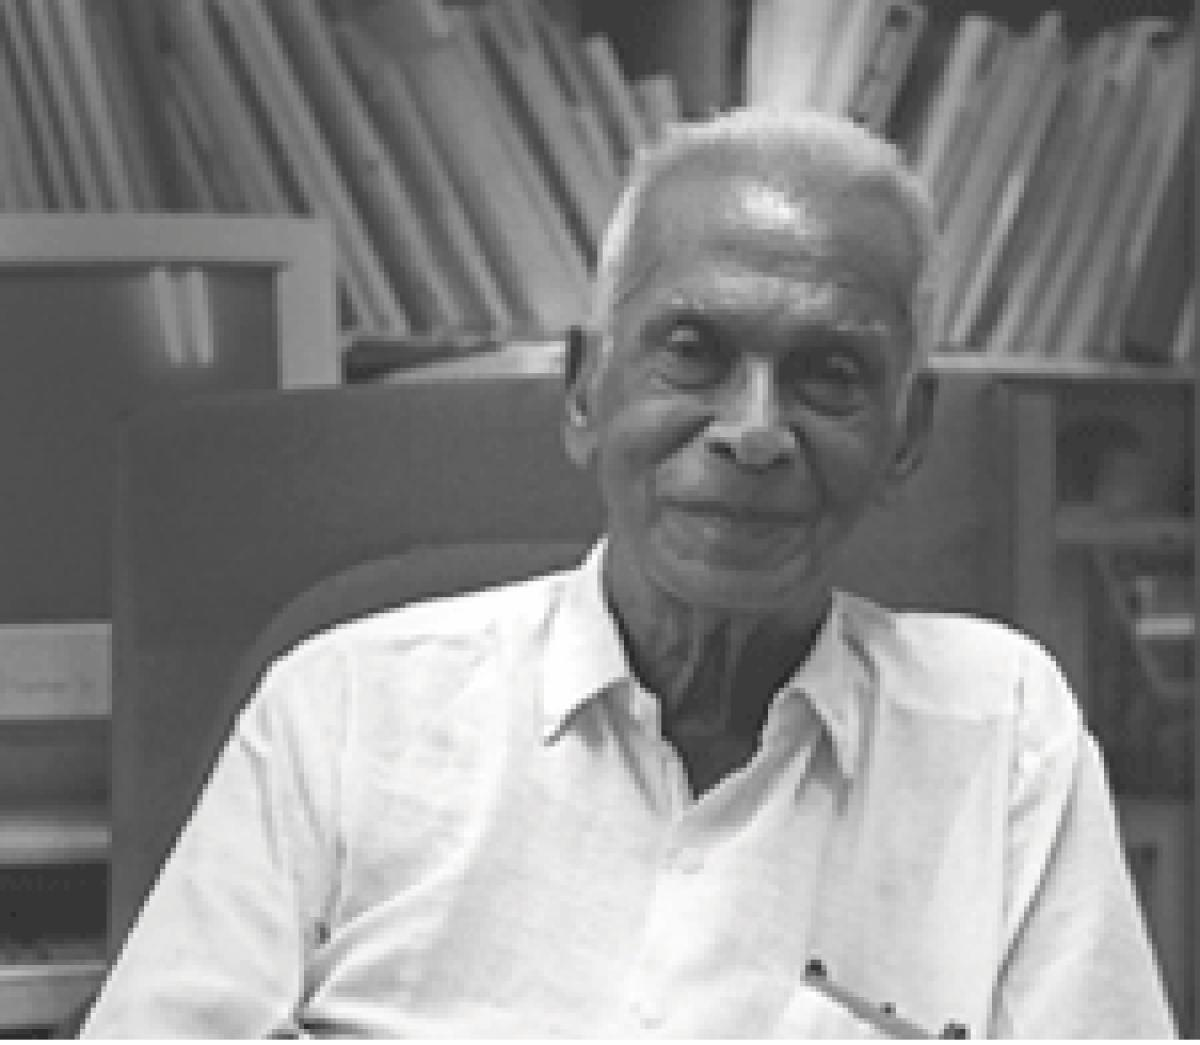 Dr G Venkataswamy, the founder of Aravind Eye Hospitals. (pic www.aravind.org)